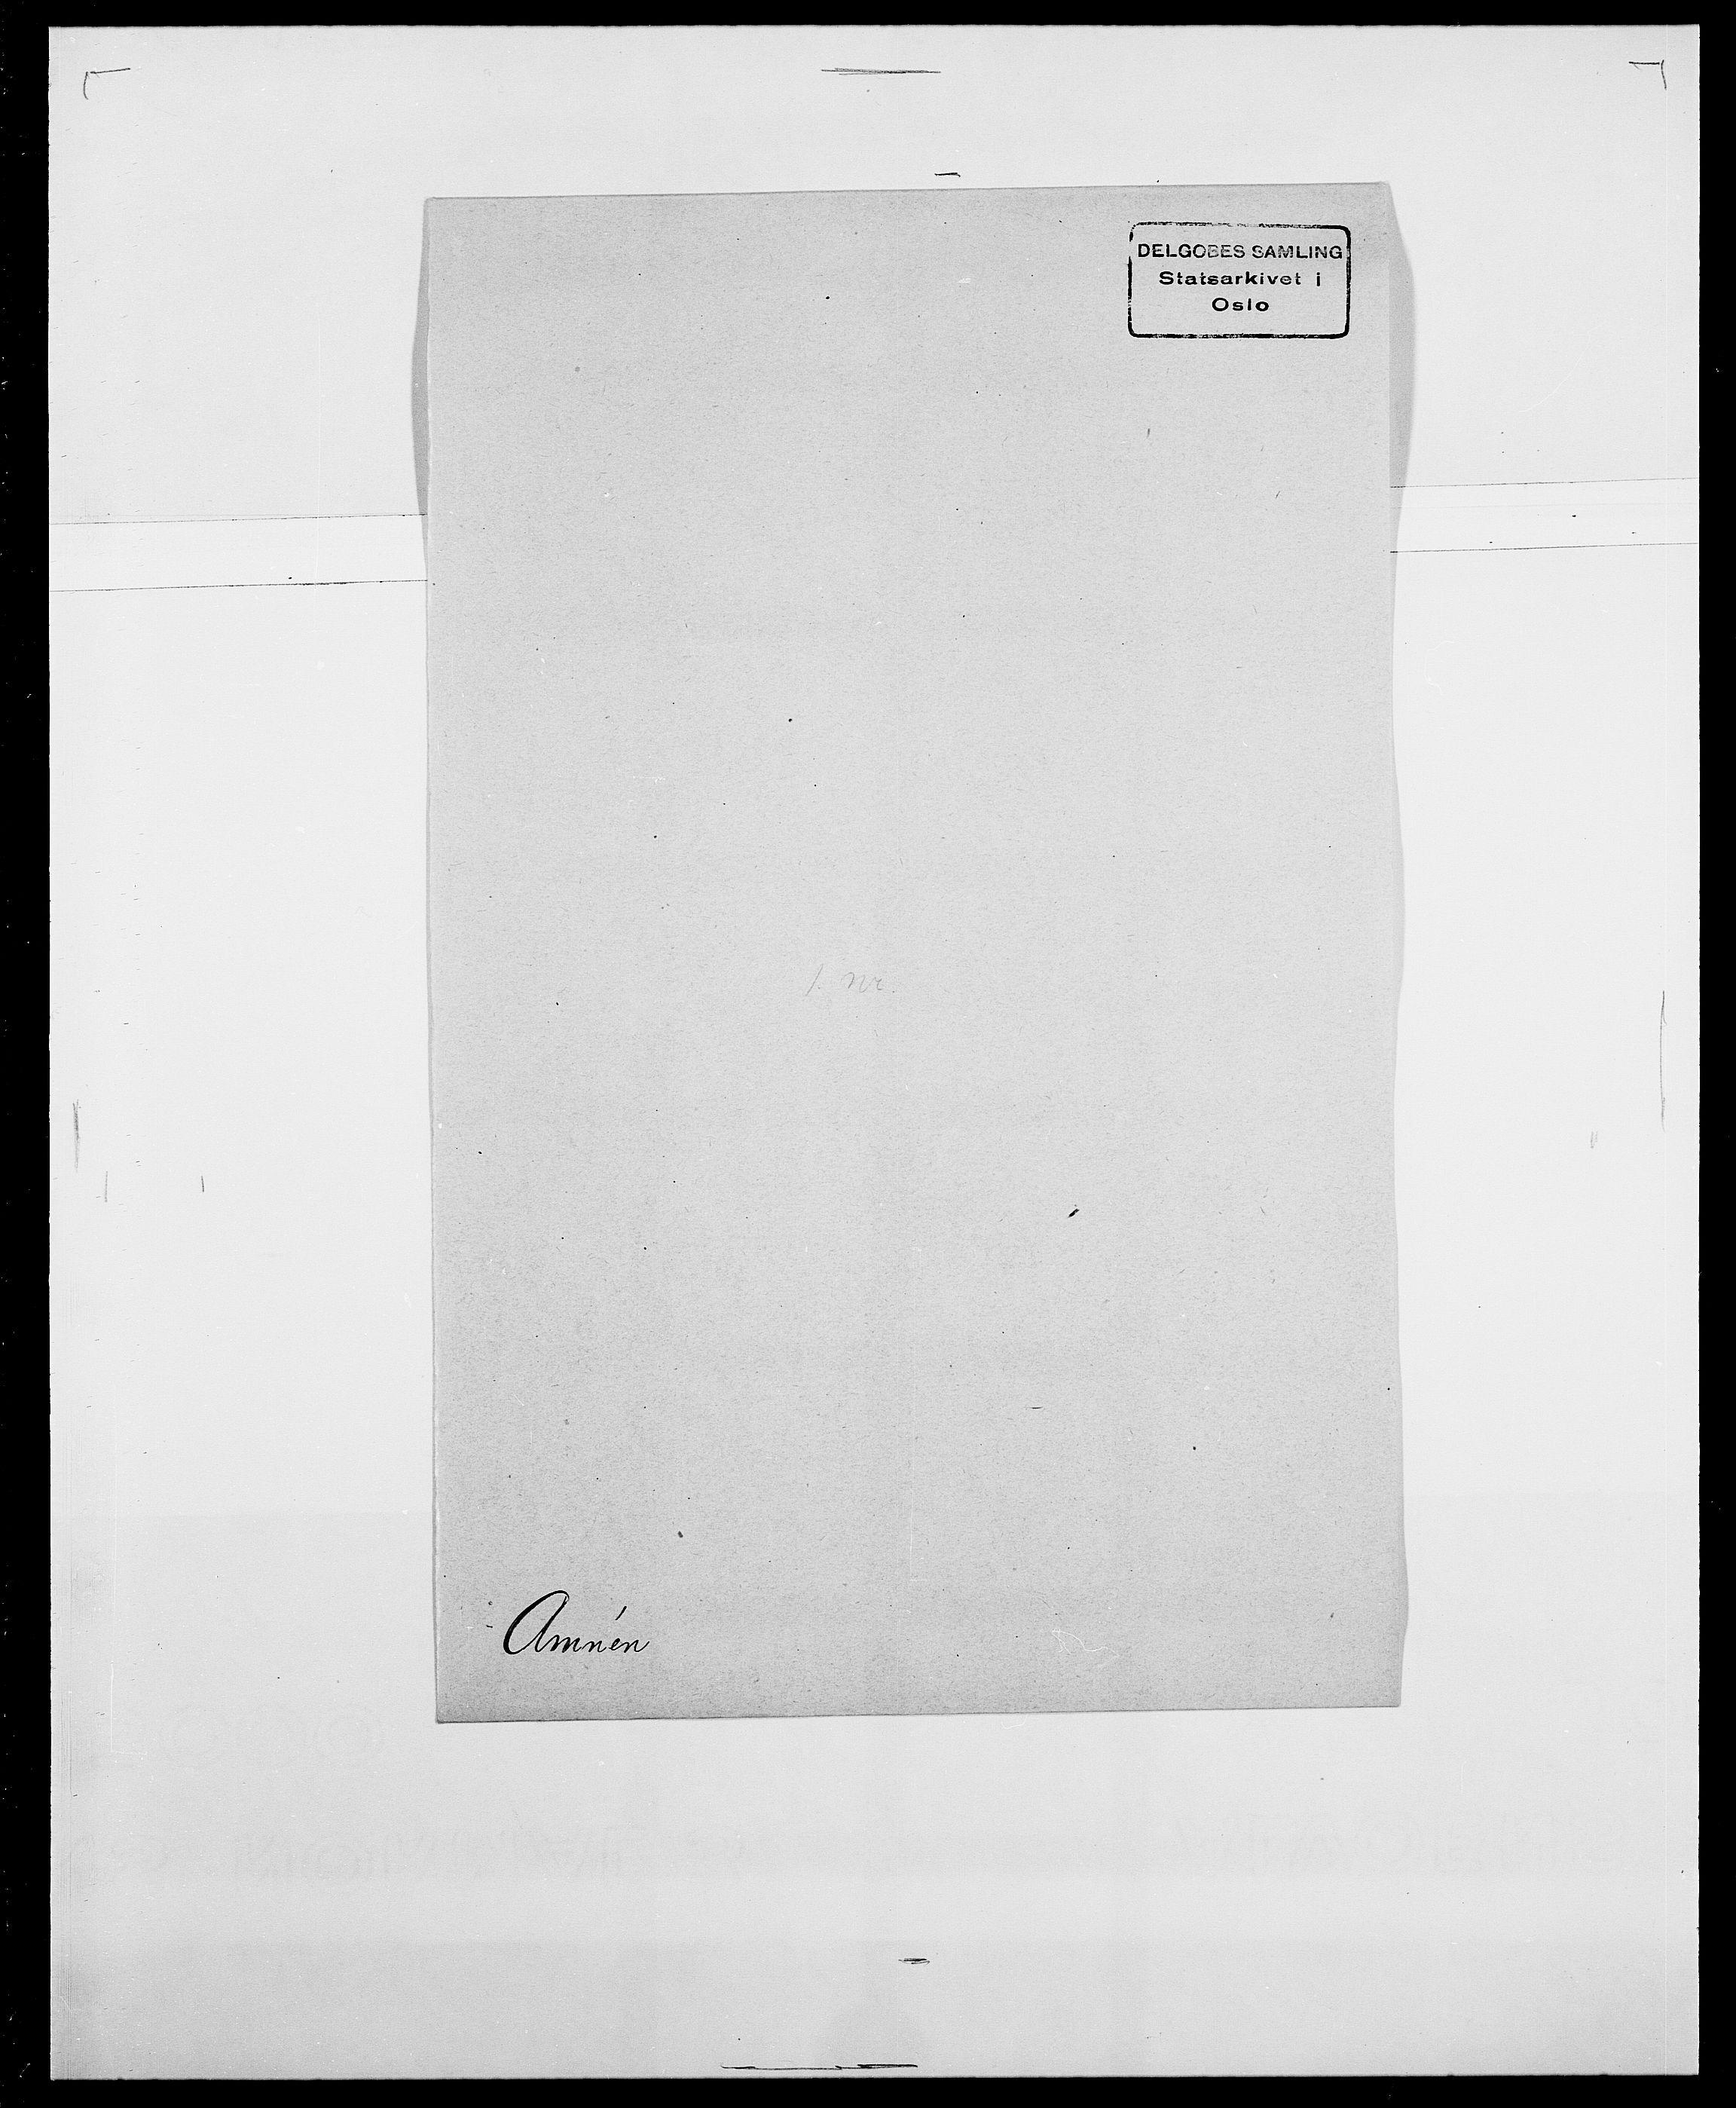 SAO, Delgobe, Charles Antoine - samling, D/Da/L0001: Aabye - Angerman, s. 547